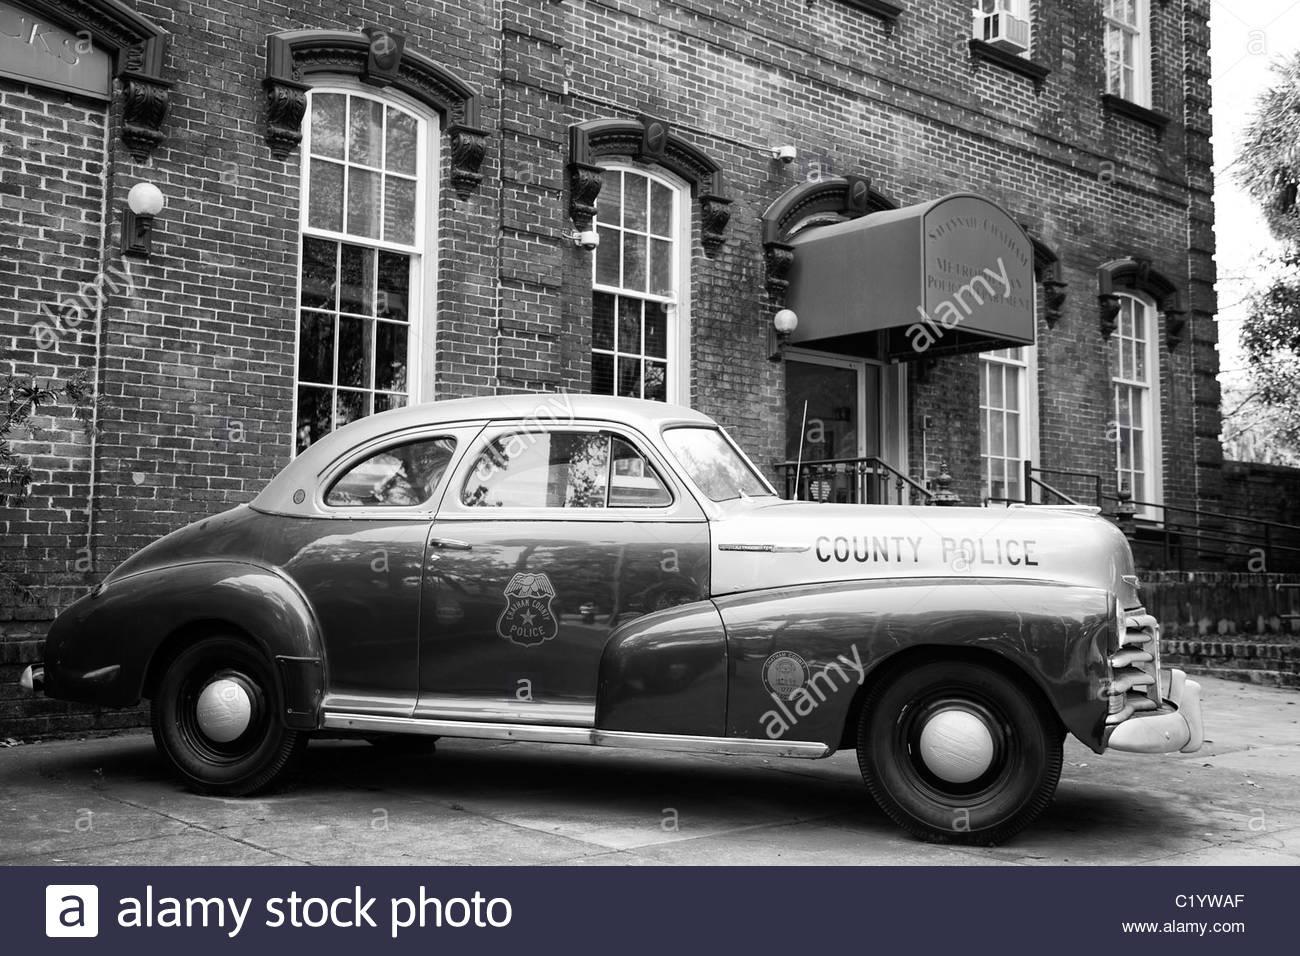 Antique Police Car, Downtown Savannah Police Station, Georgia - Stock Image